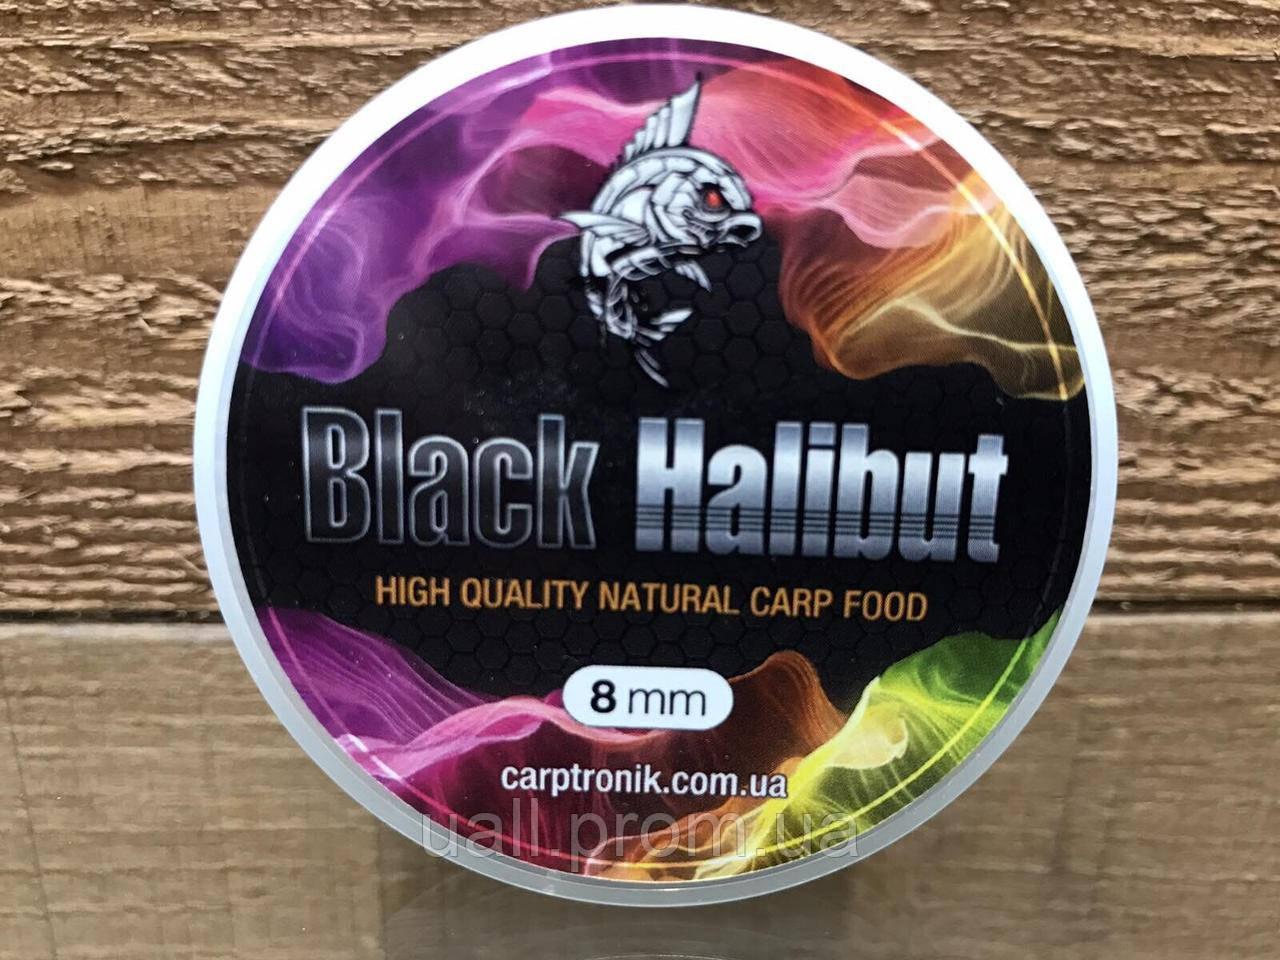 Пелець Carptronik High Attraction 8mm. Black Halibut